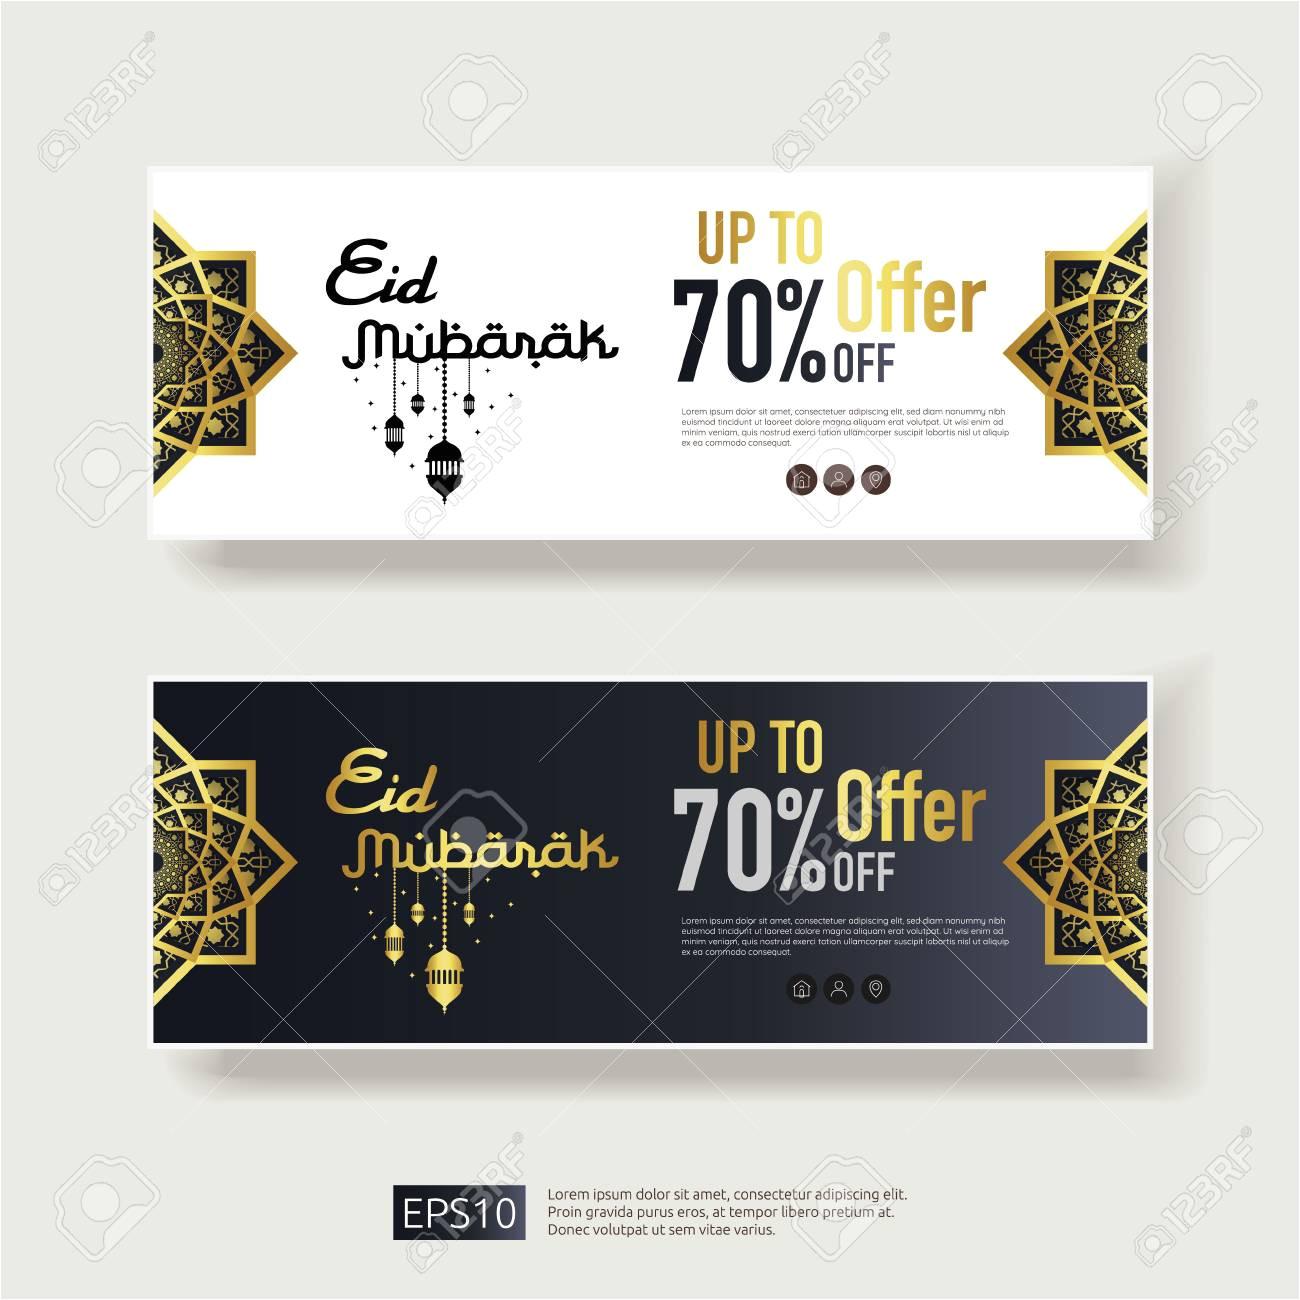 112344624 eid al adha or fitr mubarak sale offer banner design with abstract mandala with pattern ornament ele jpg